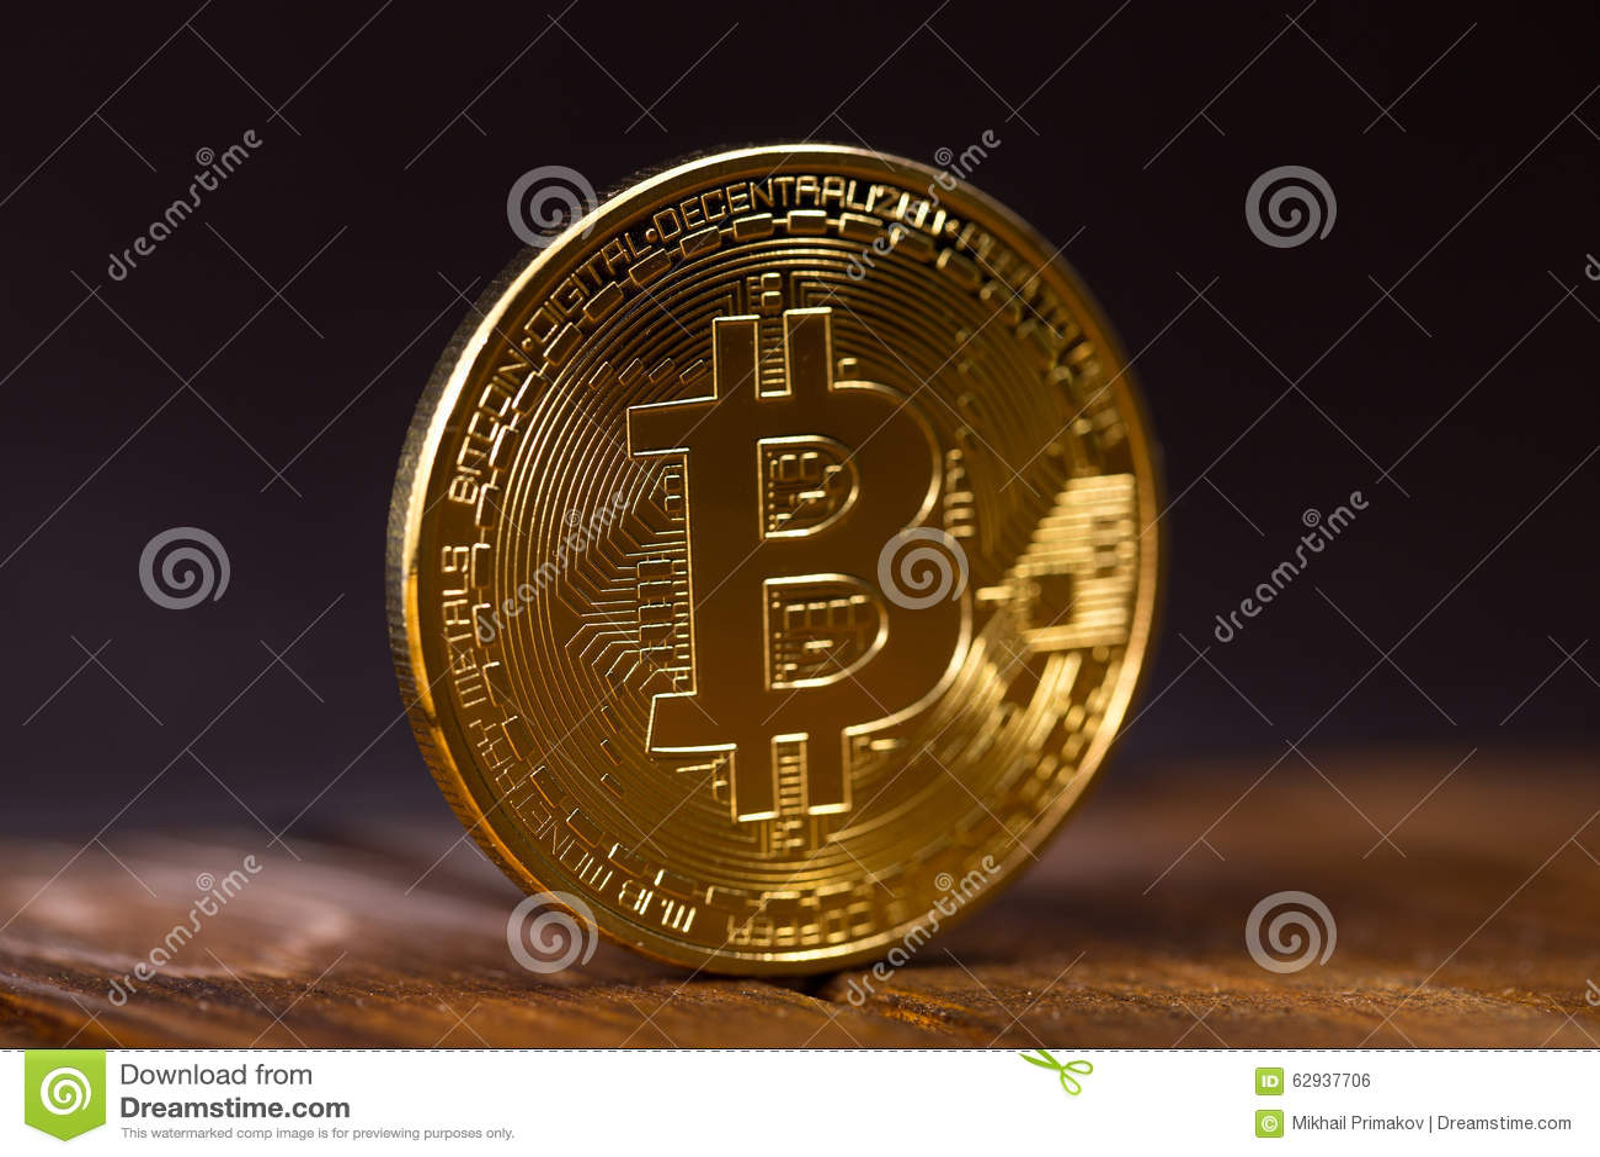 What is bitcoins stock symbol united kingdom eu referendum betting